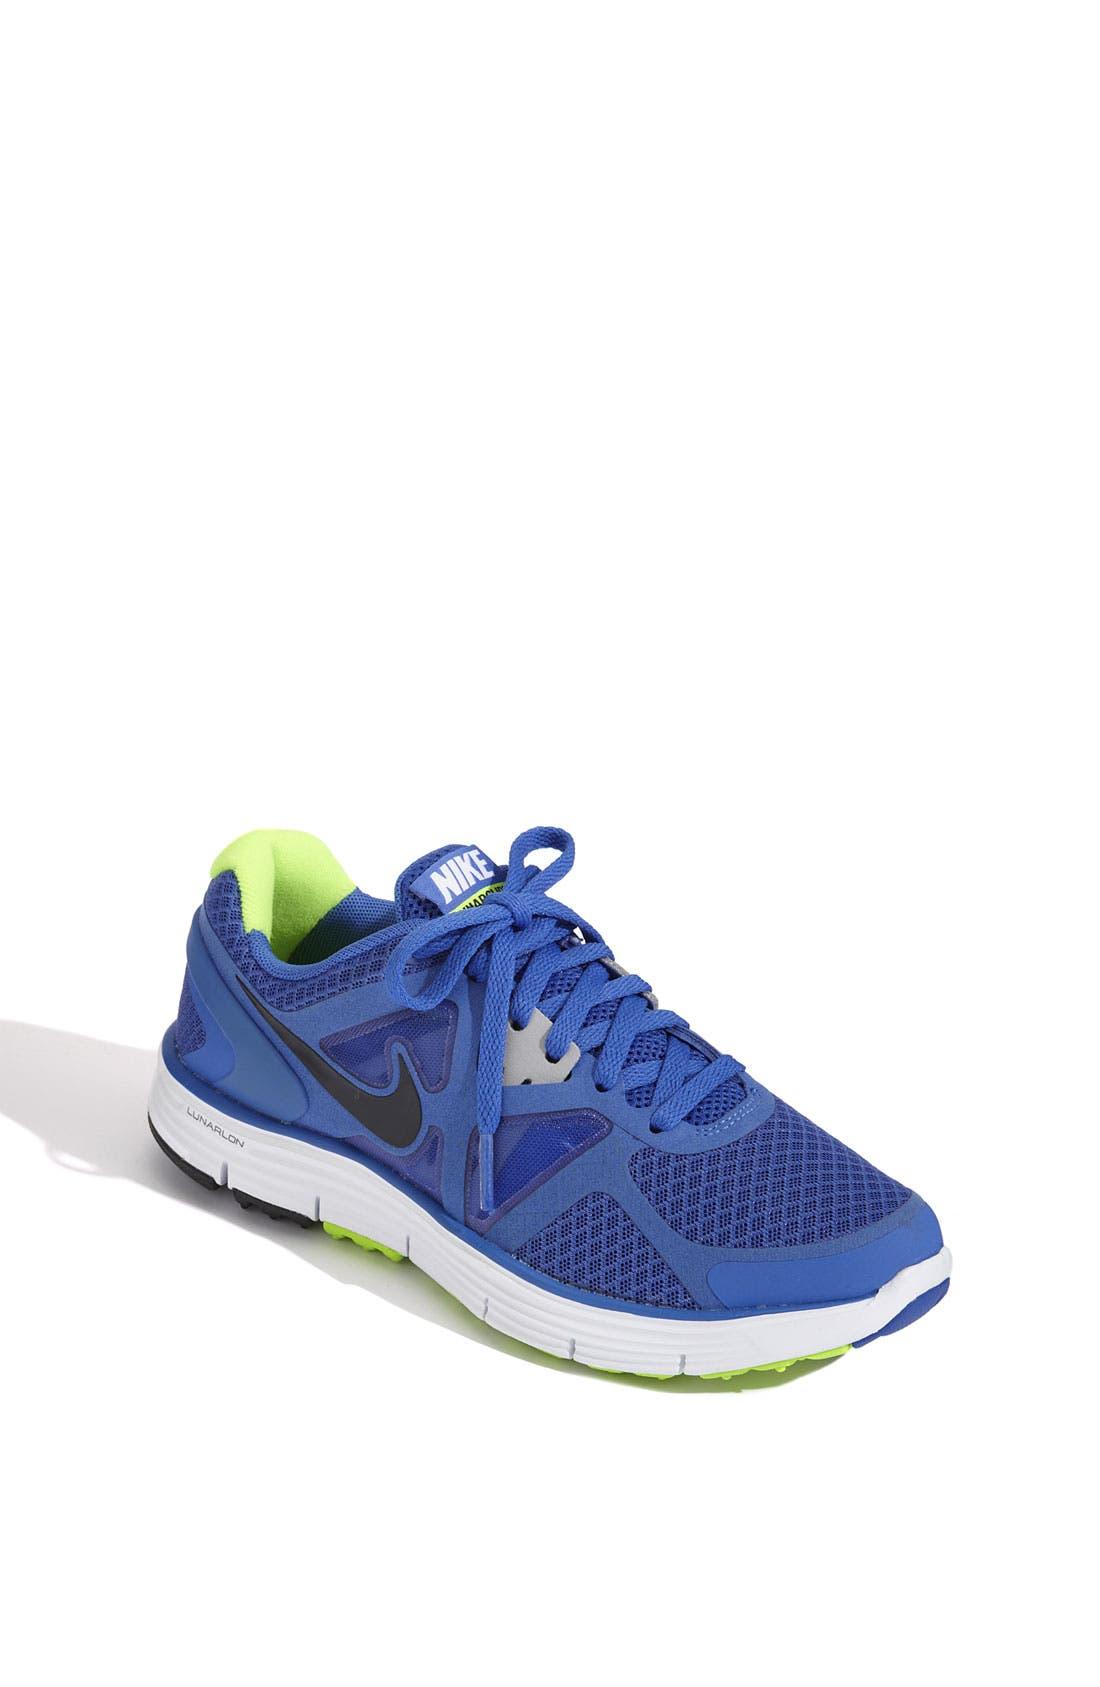 Alternate Image 1 Selected - Nike 'LunarGlide 3' Running Shoe (Toddler, Little Kid & Big Kid)